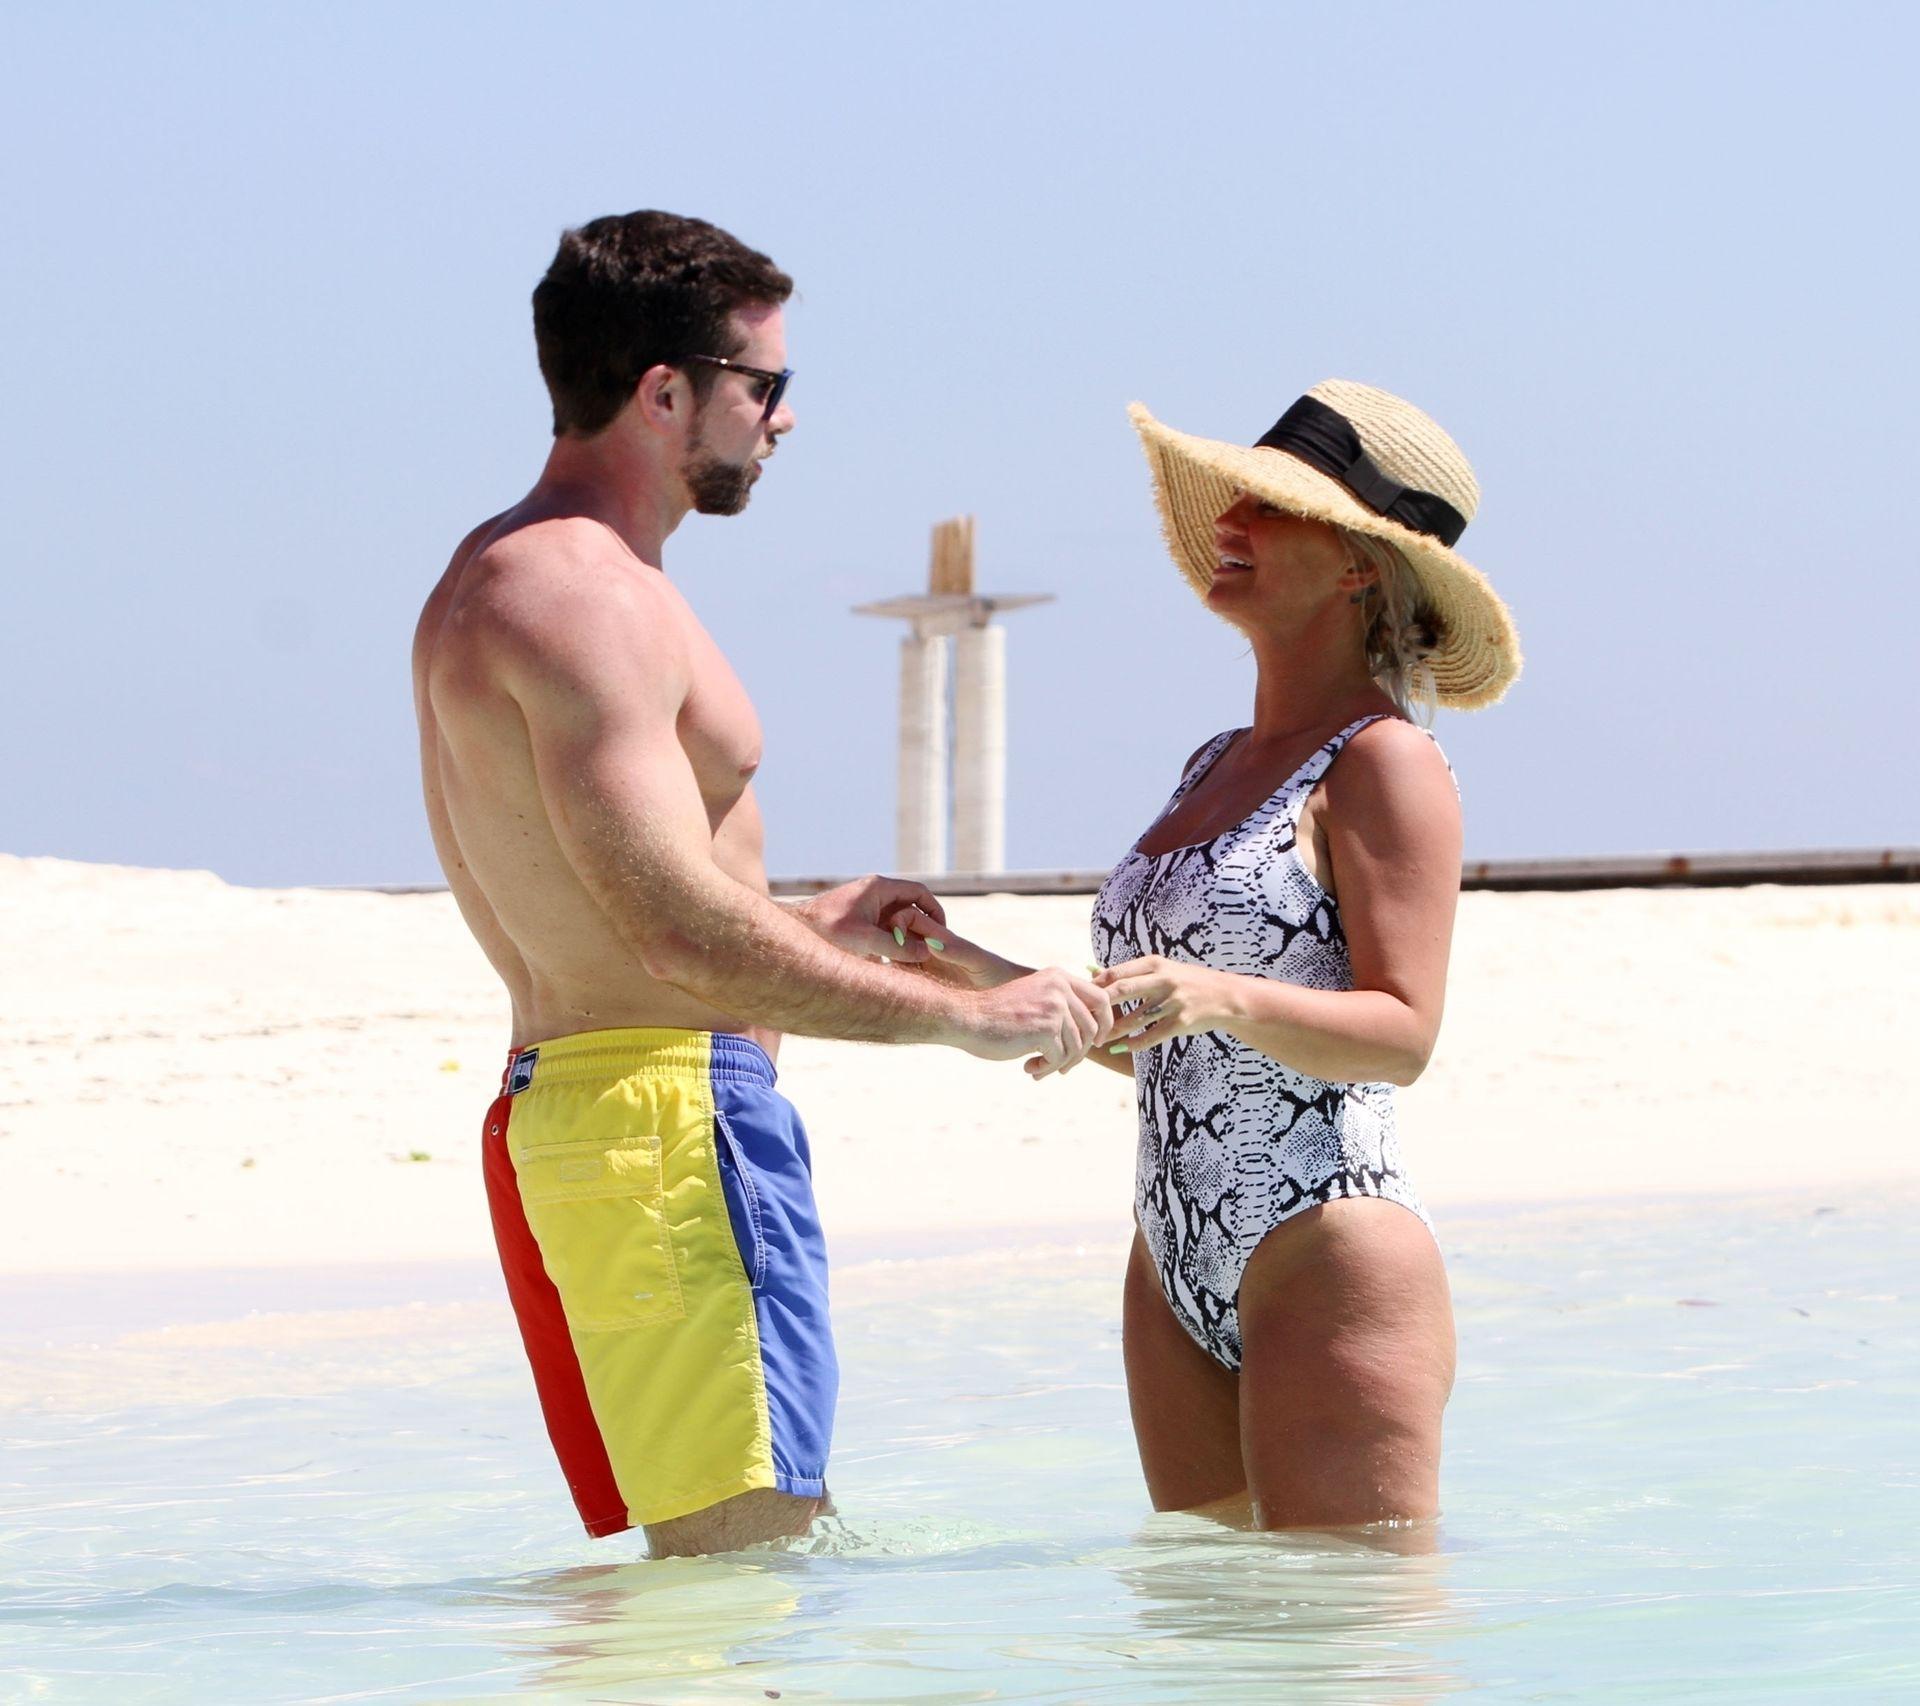 Kerry Katona & Ryan Mahoney Hit The Beach On Holiday At Their Luxury 5 Star Resort Ayada Maldives 0019